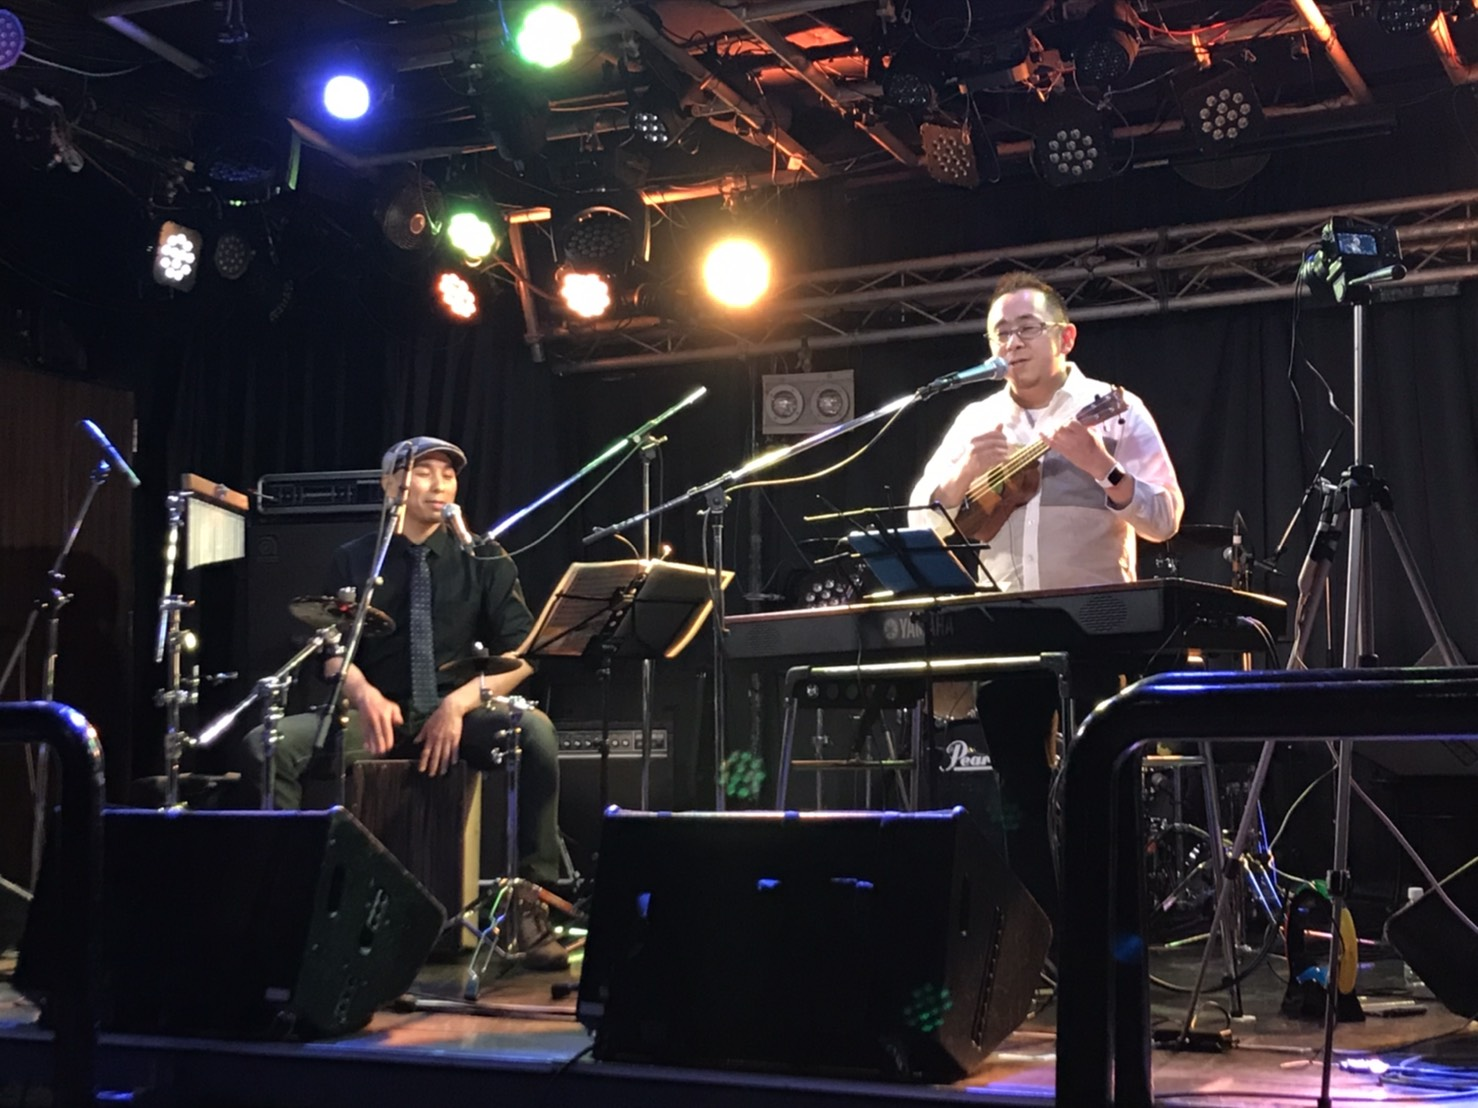 Sugimotoman presents ワンマンライブ 「321 Live 番・外・編 〜 3+2+1全部足したら6だった」